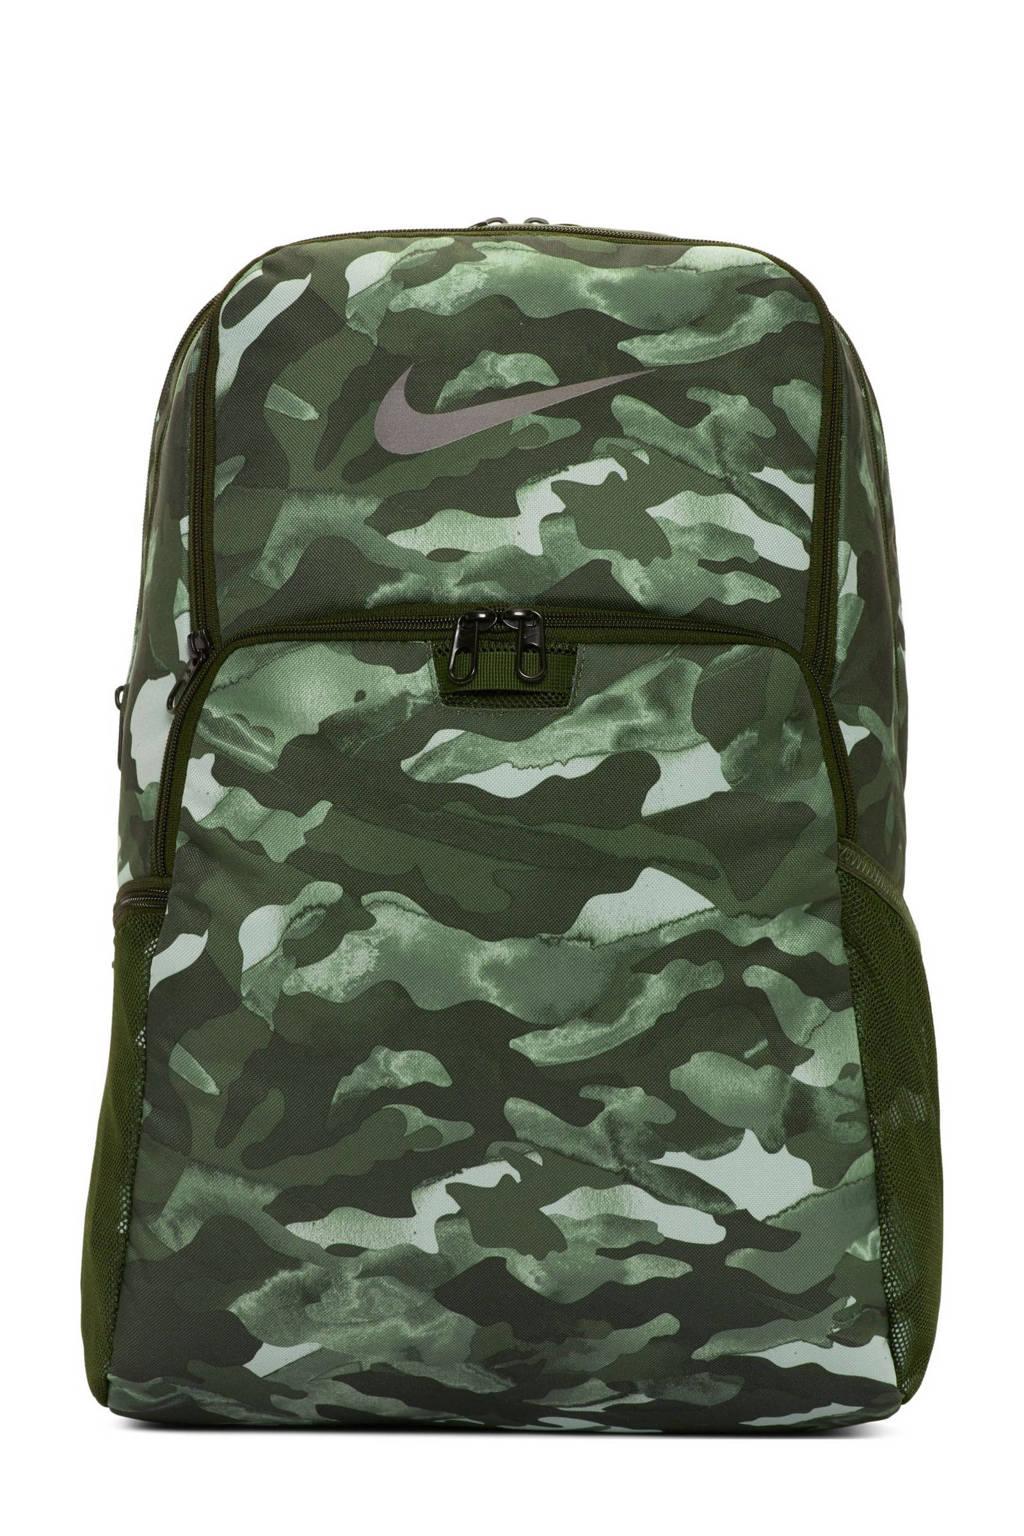 Nike   rugzak Brasilia XL zwart/grijs/groen, Zwart/grijs/groen